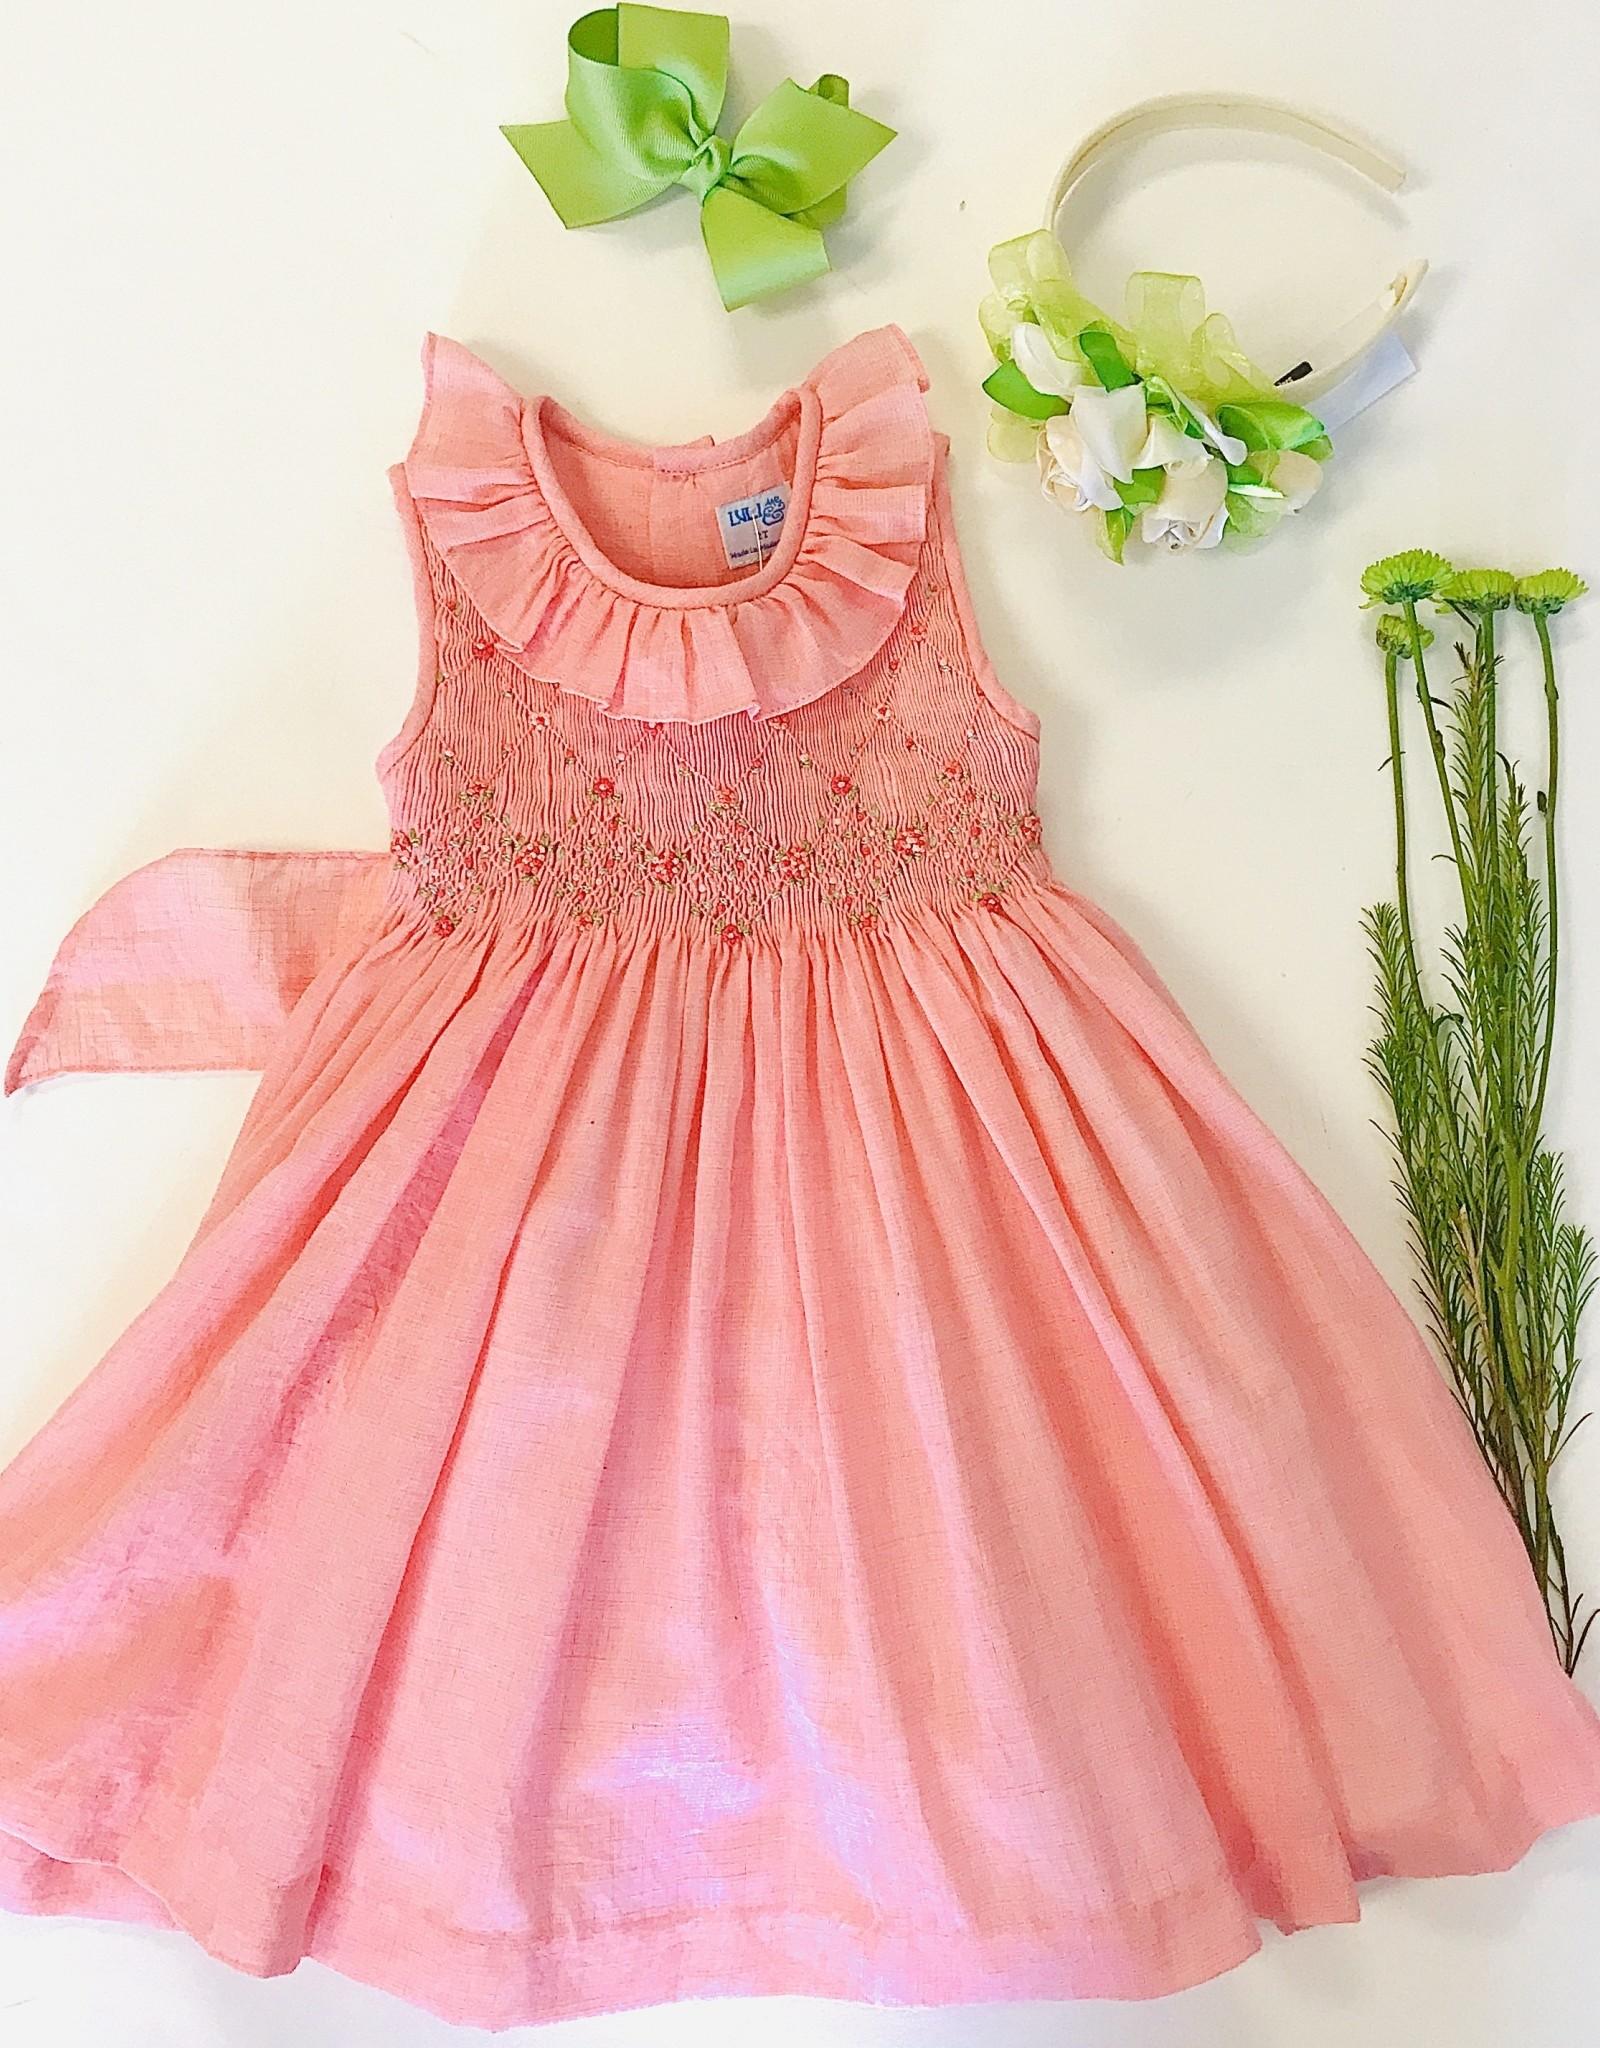 Luli Coral Smocked Dress